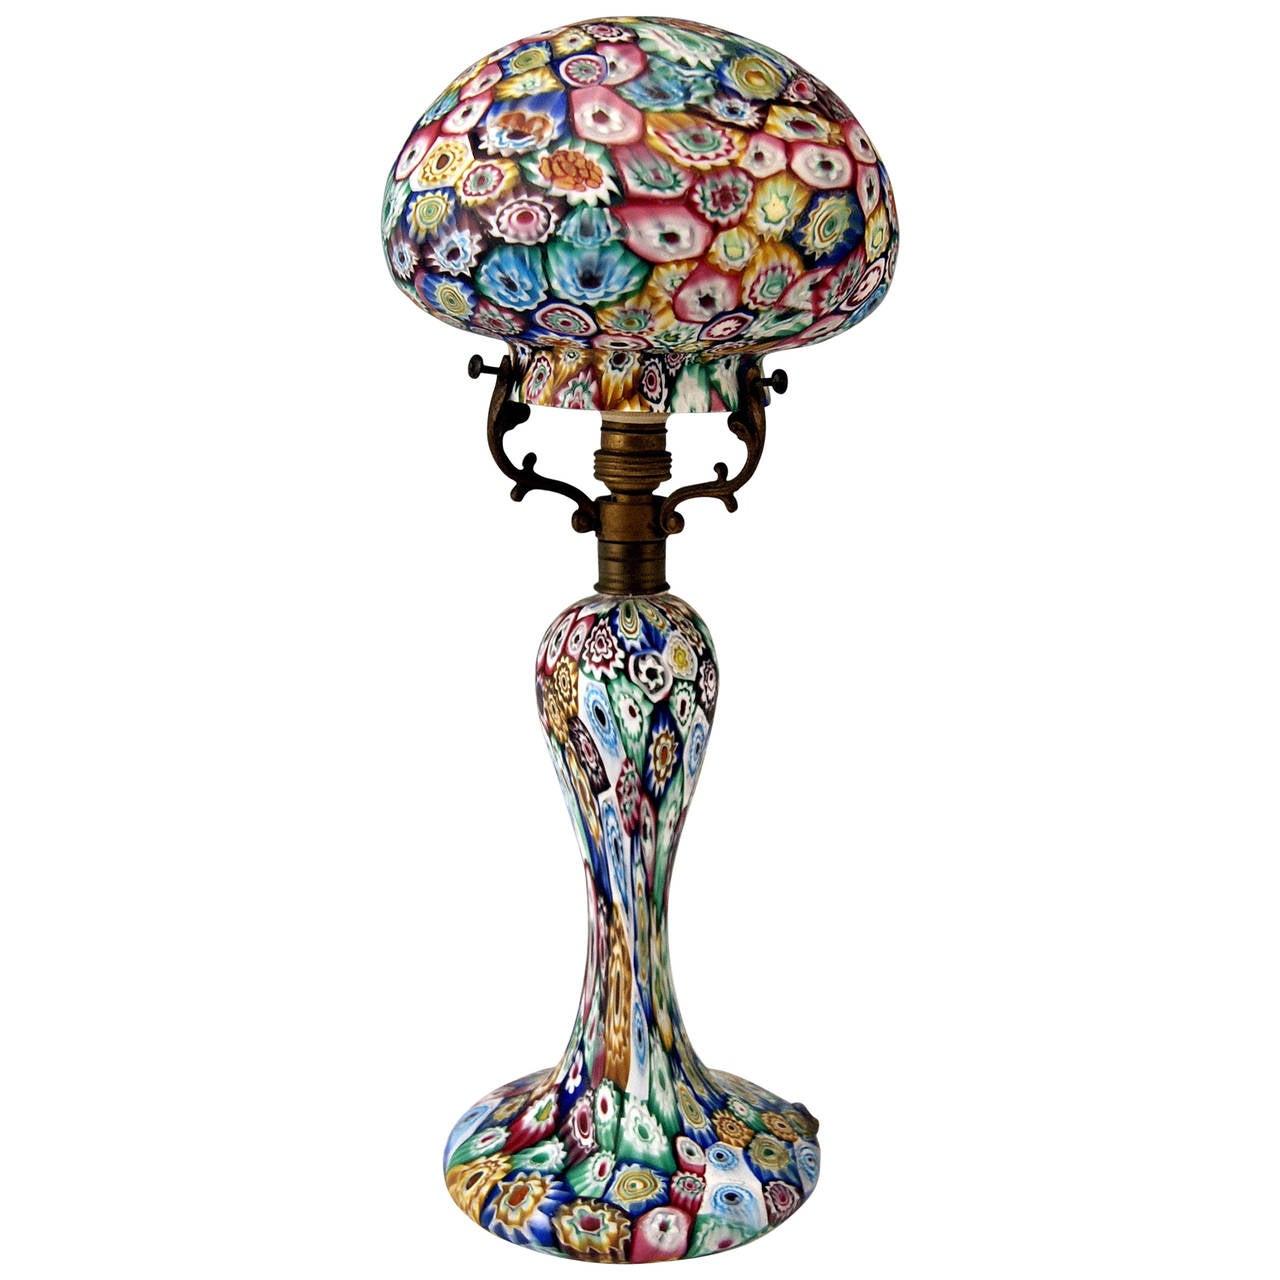 murano vintage glass lamp millefiori fratelli toso circa. Black Bedroom Furniture Sets. Home Design Ideas